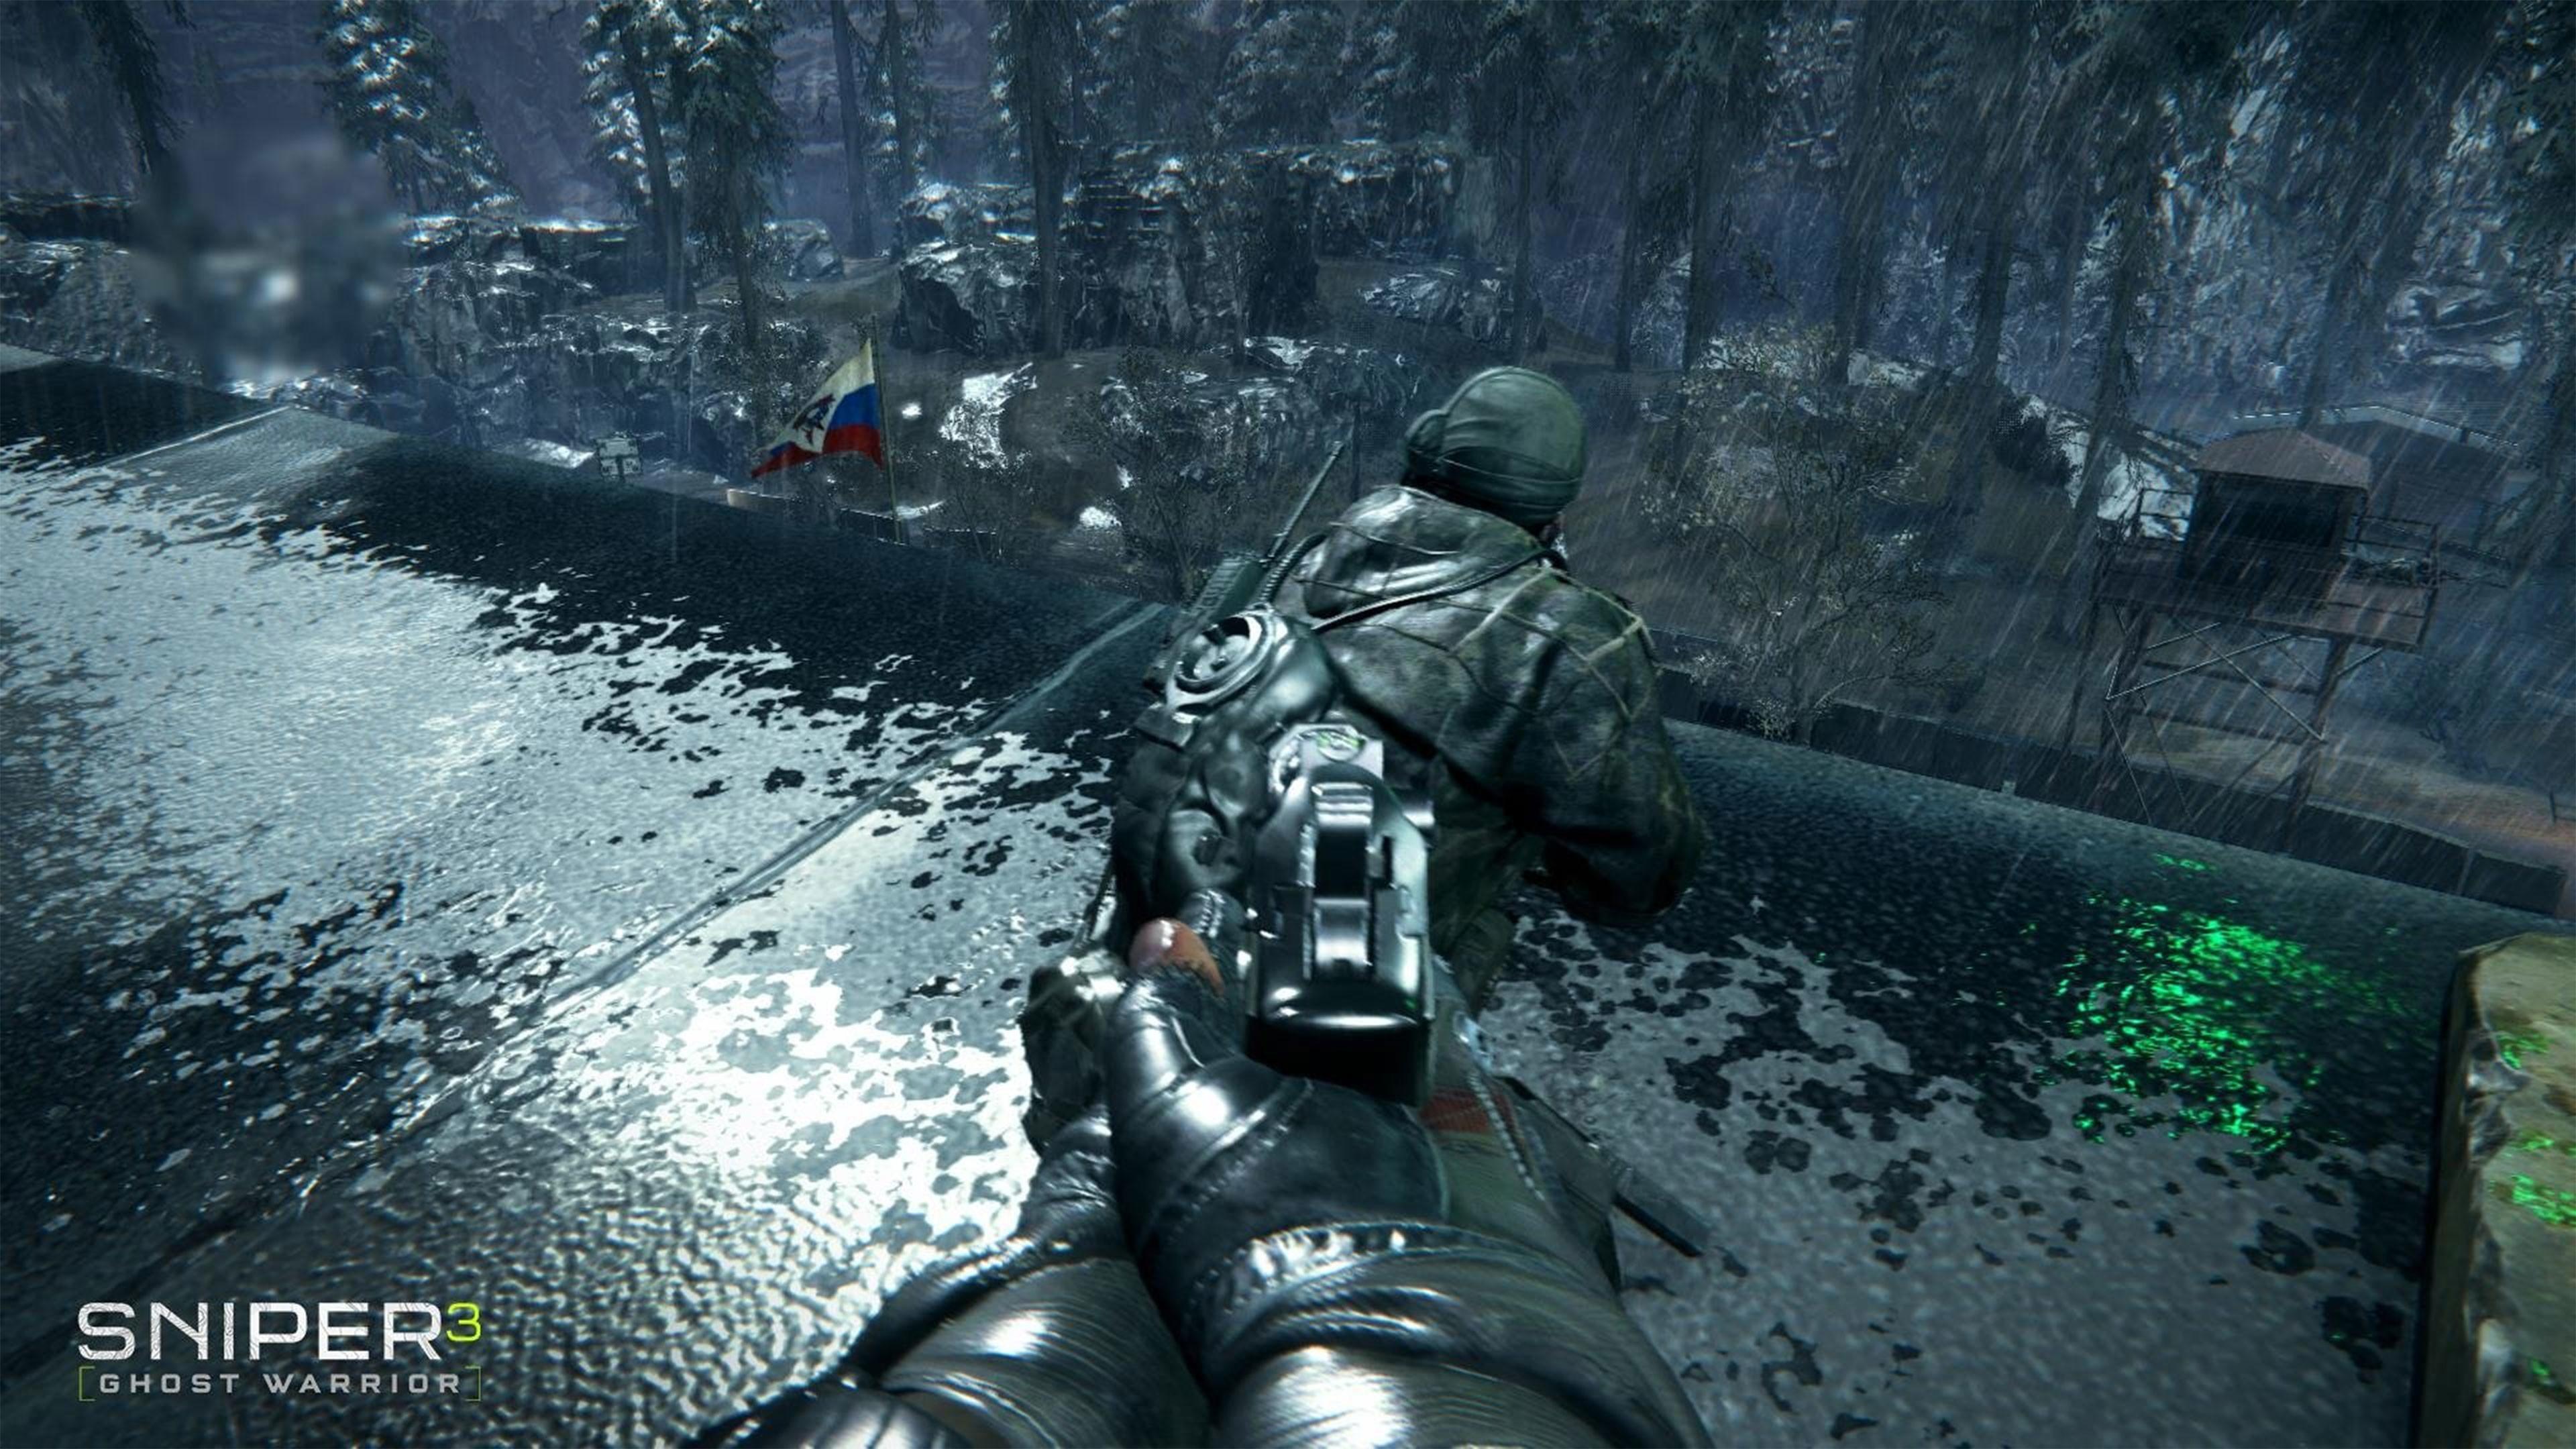 Res: 3840x2160, Sniper Ghost Warrior 3 4K Wallpaper ...